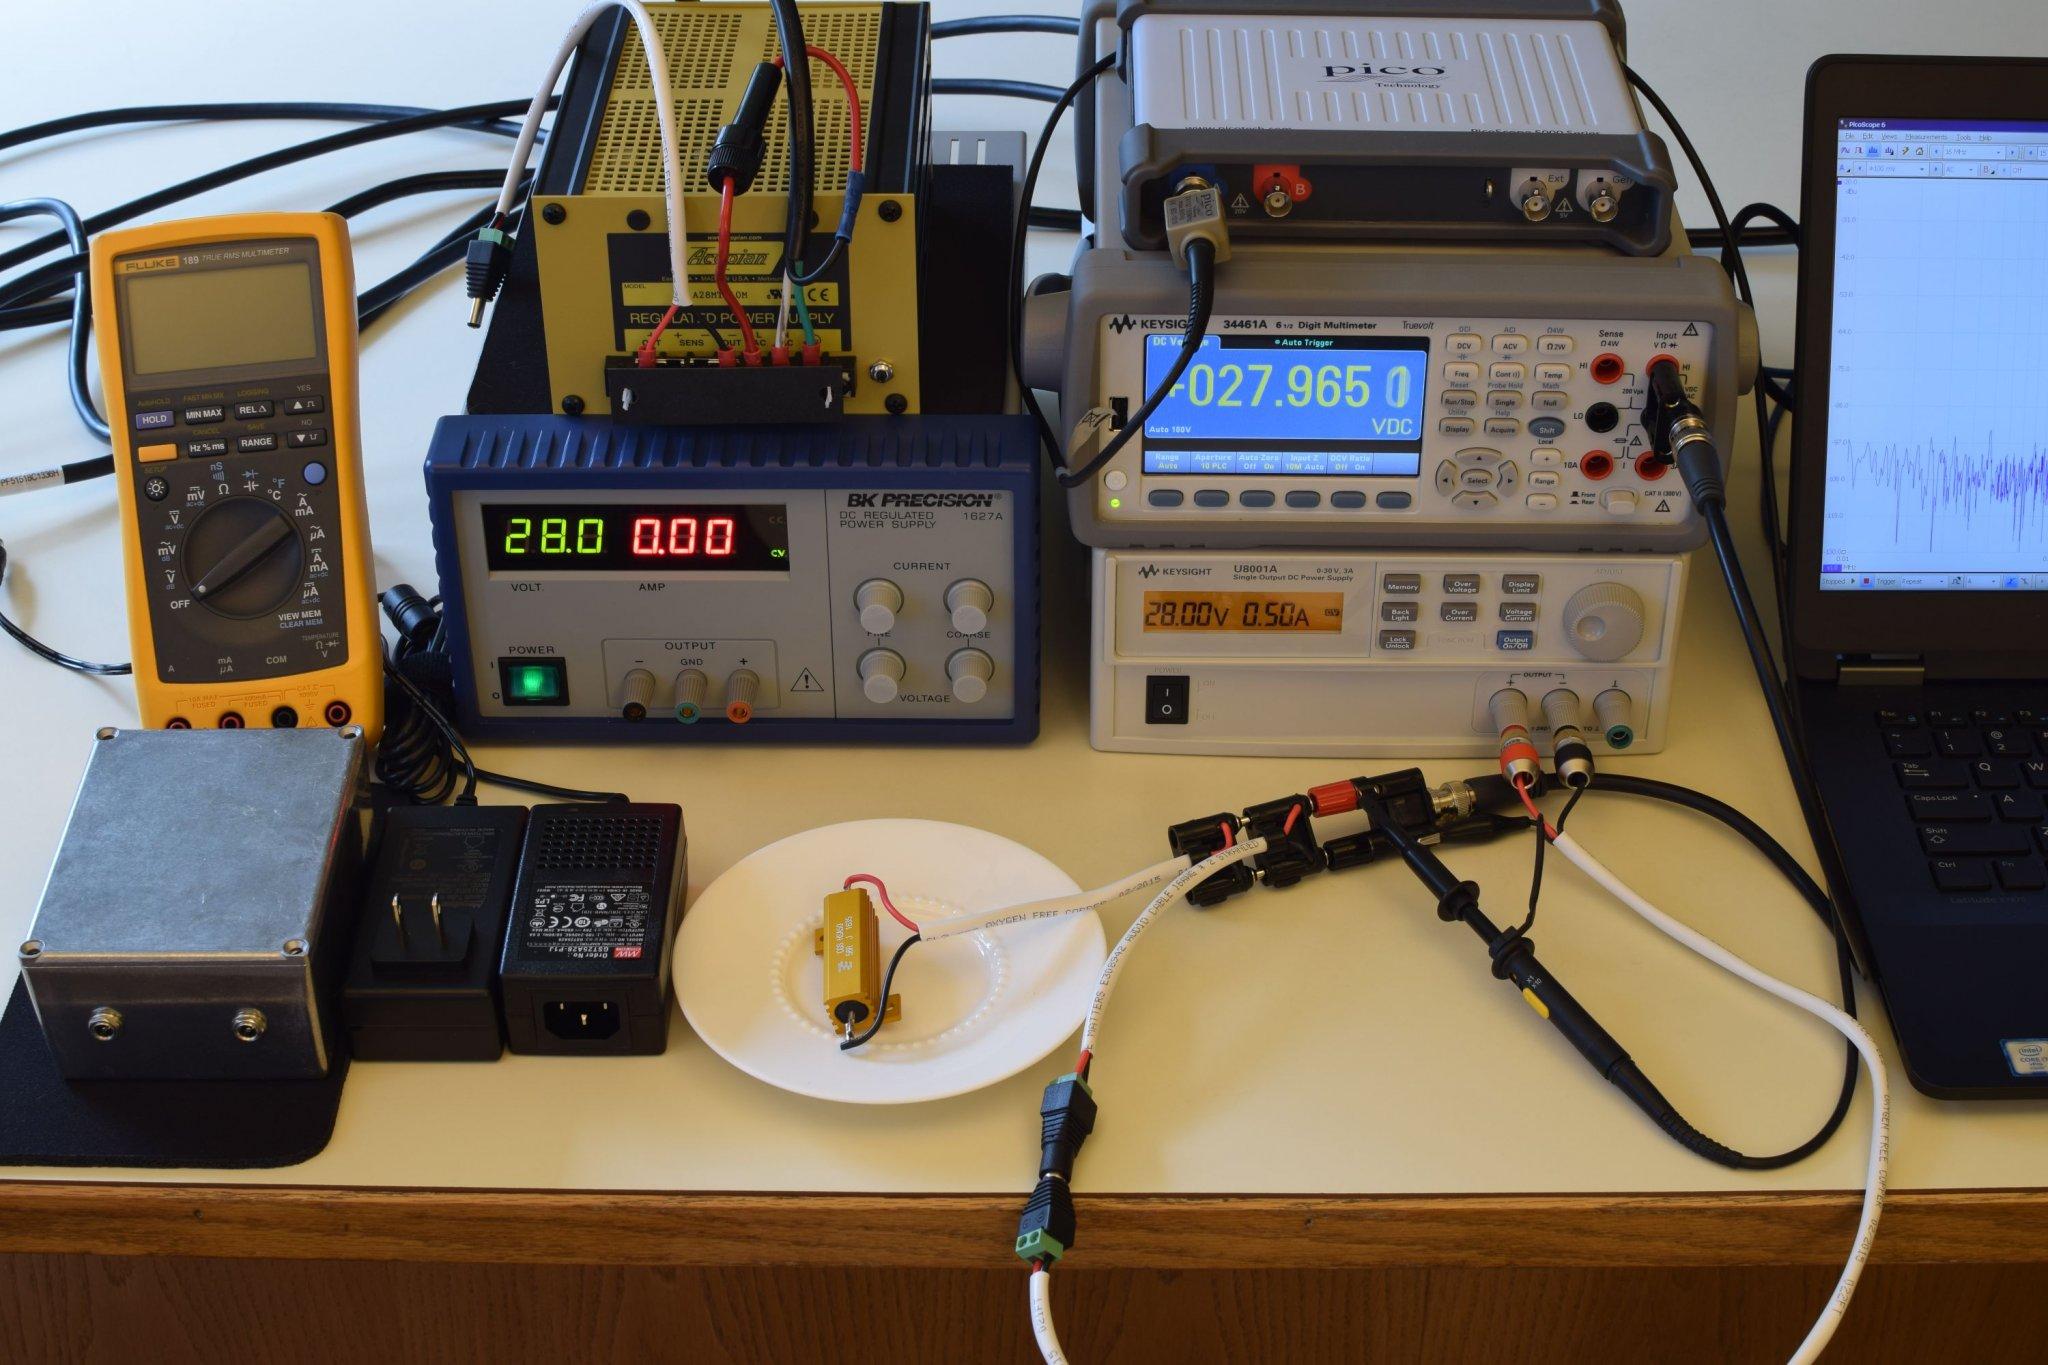 20180325 multiple LPS - SMPS noise measurements - small.JPG